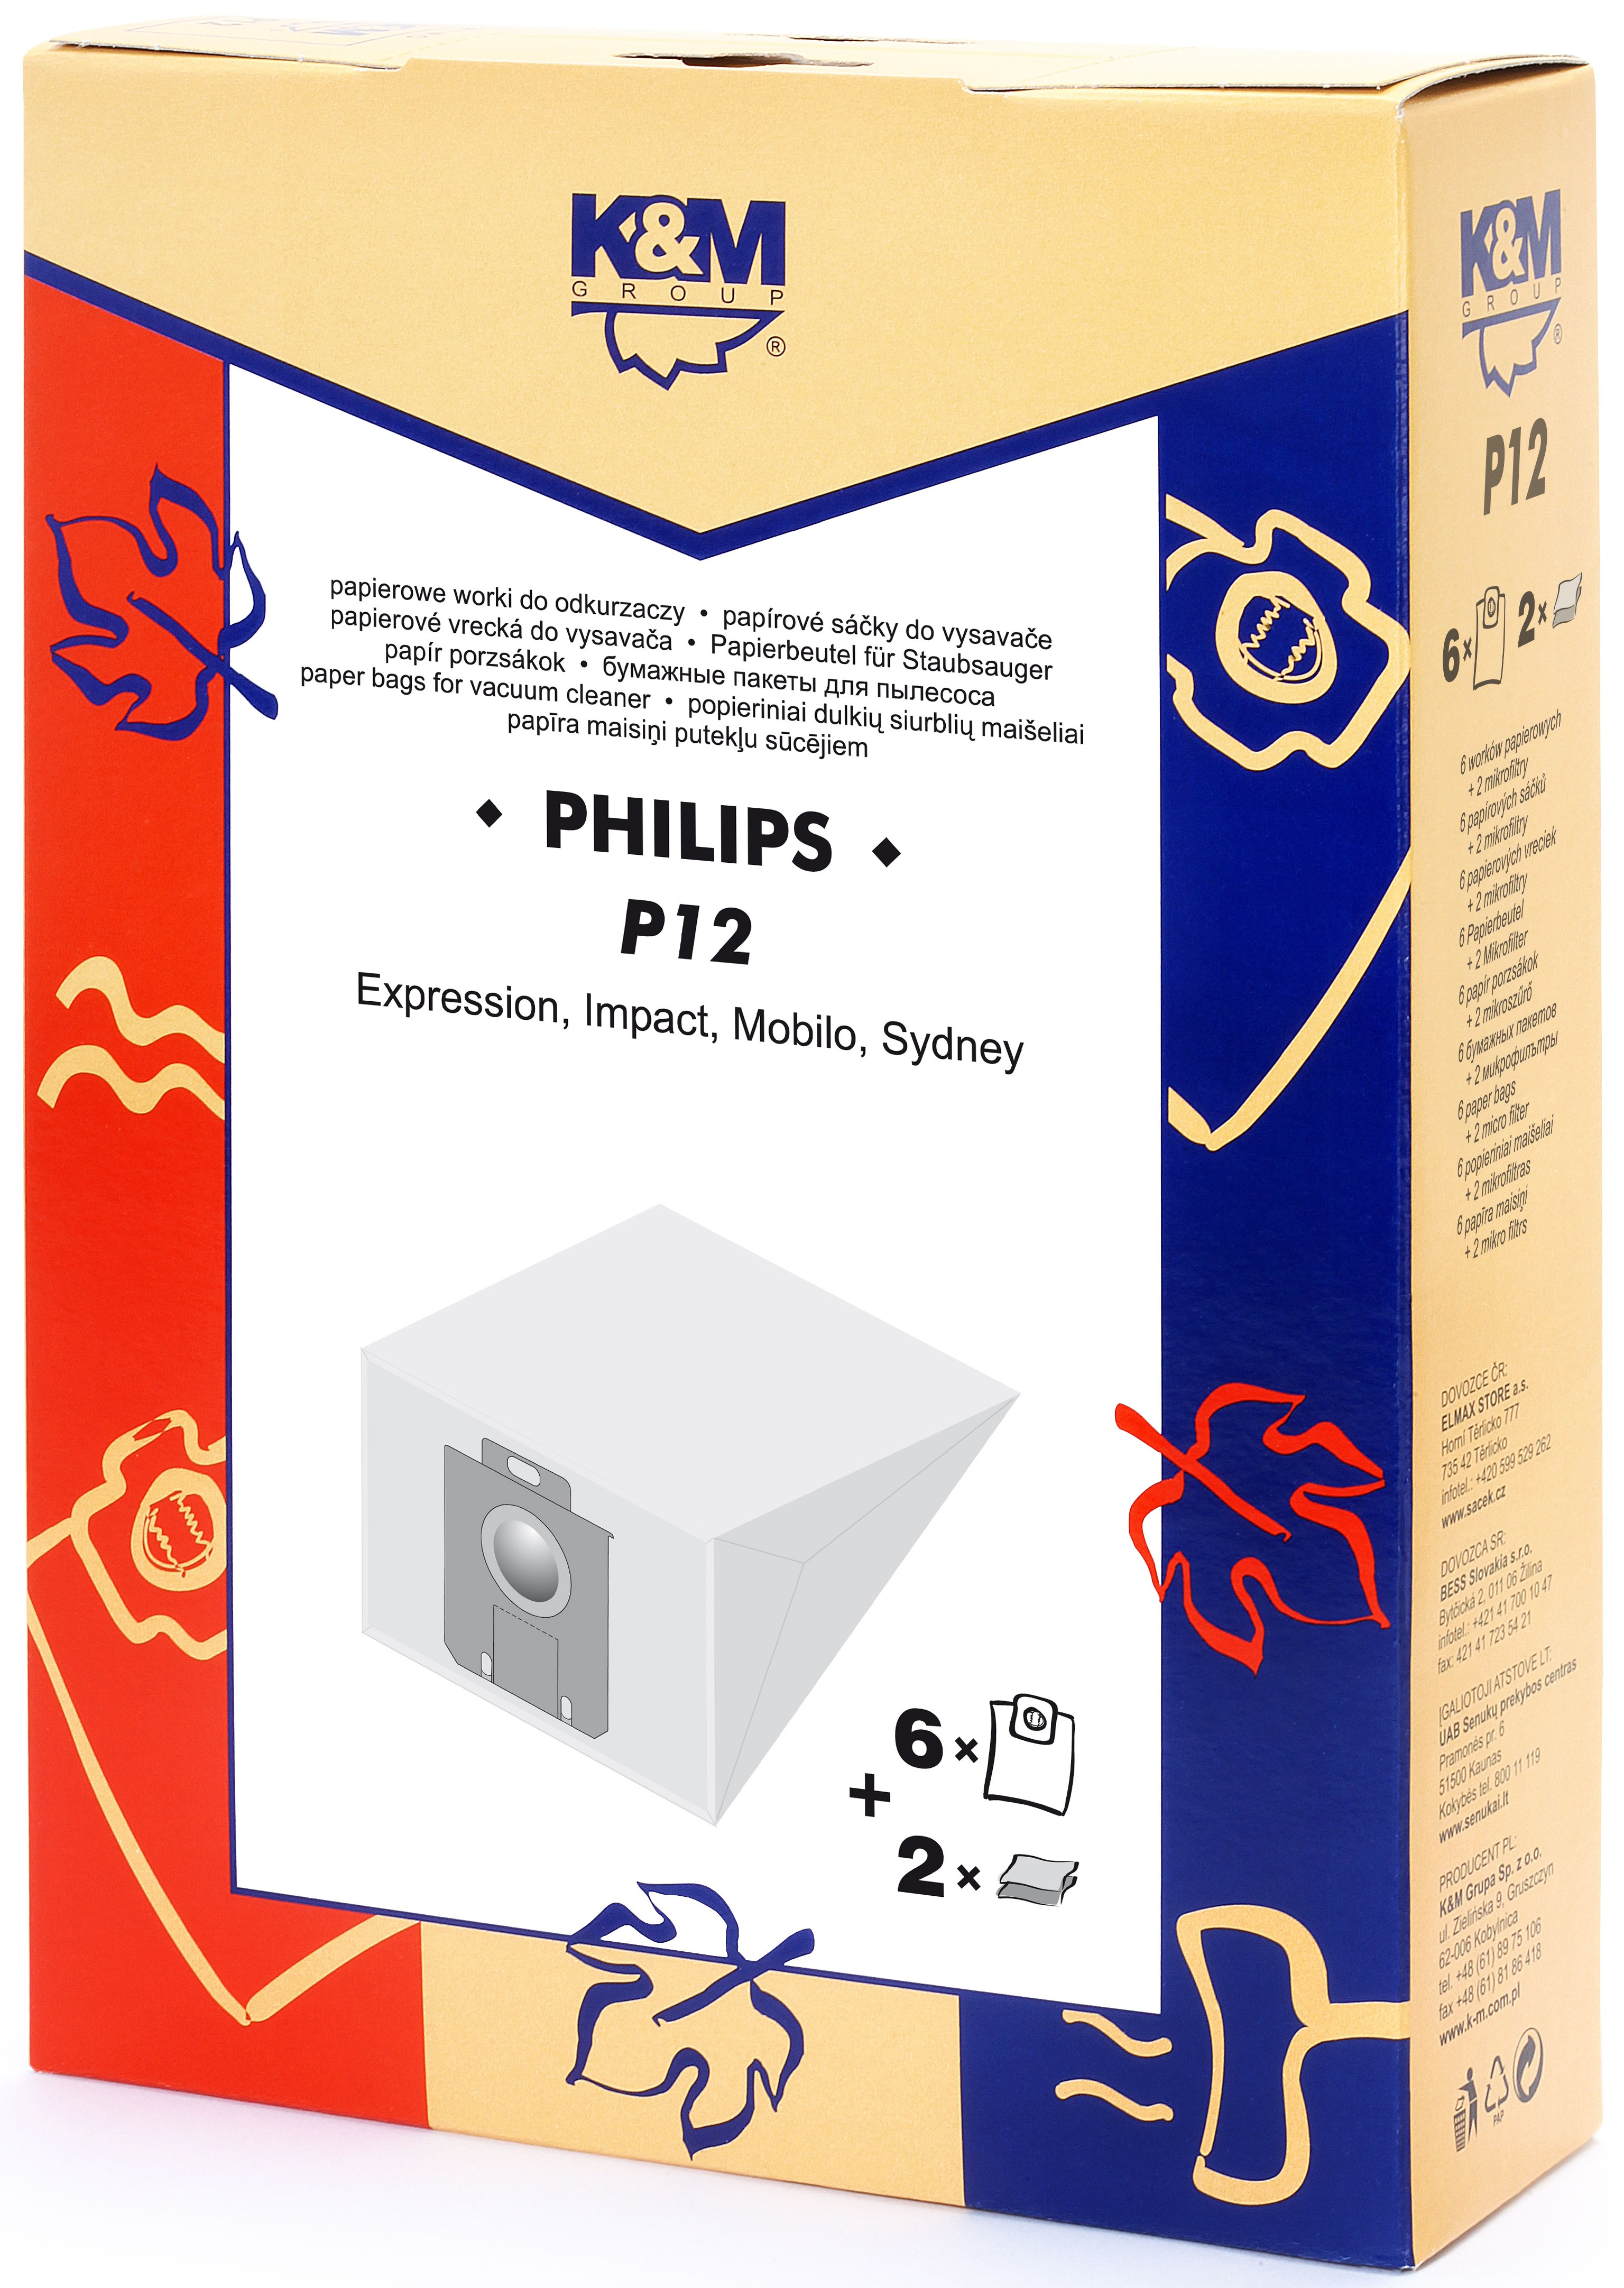 Sac aspirator Philips Sydney, hartie, 6x saci + 2 filtre, K&M [0]